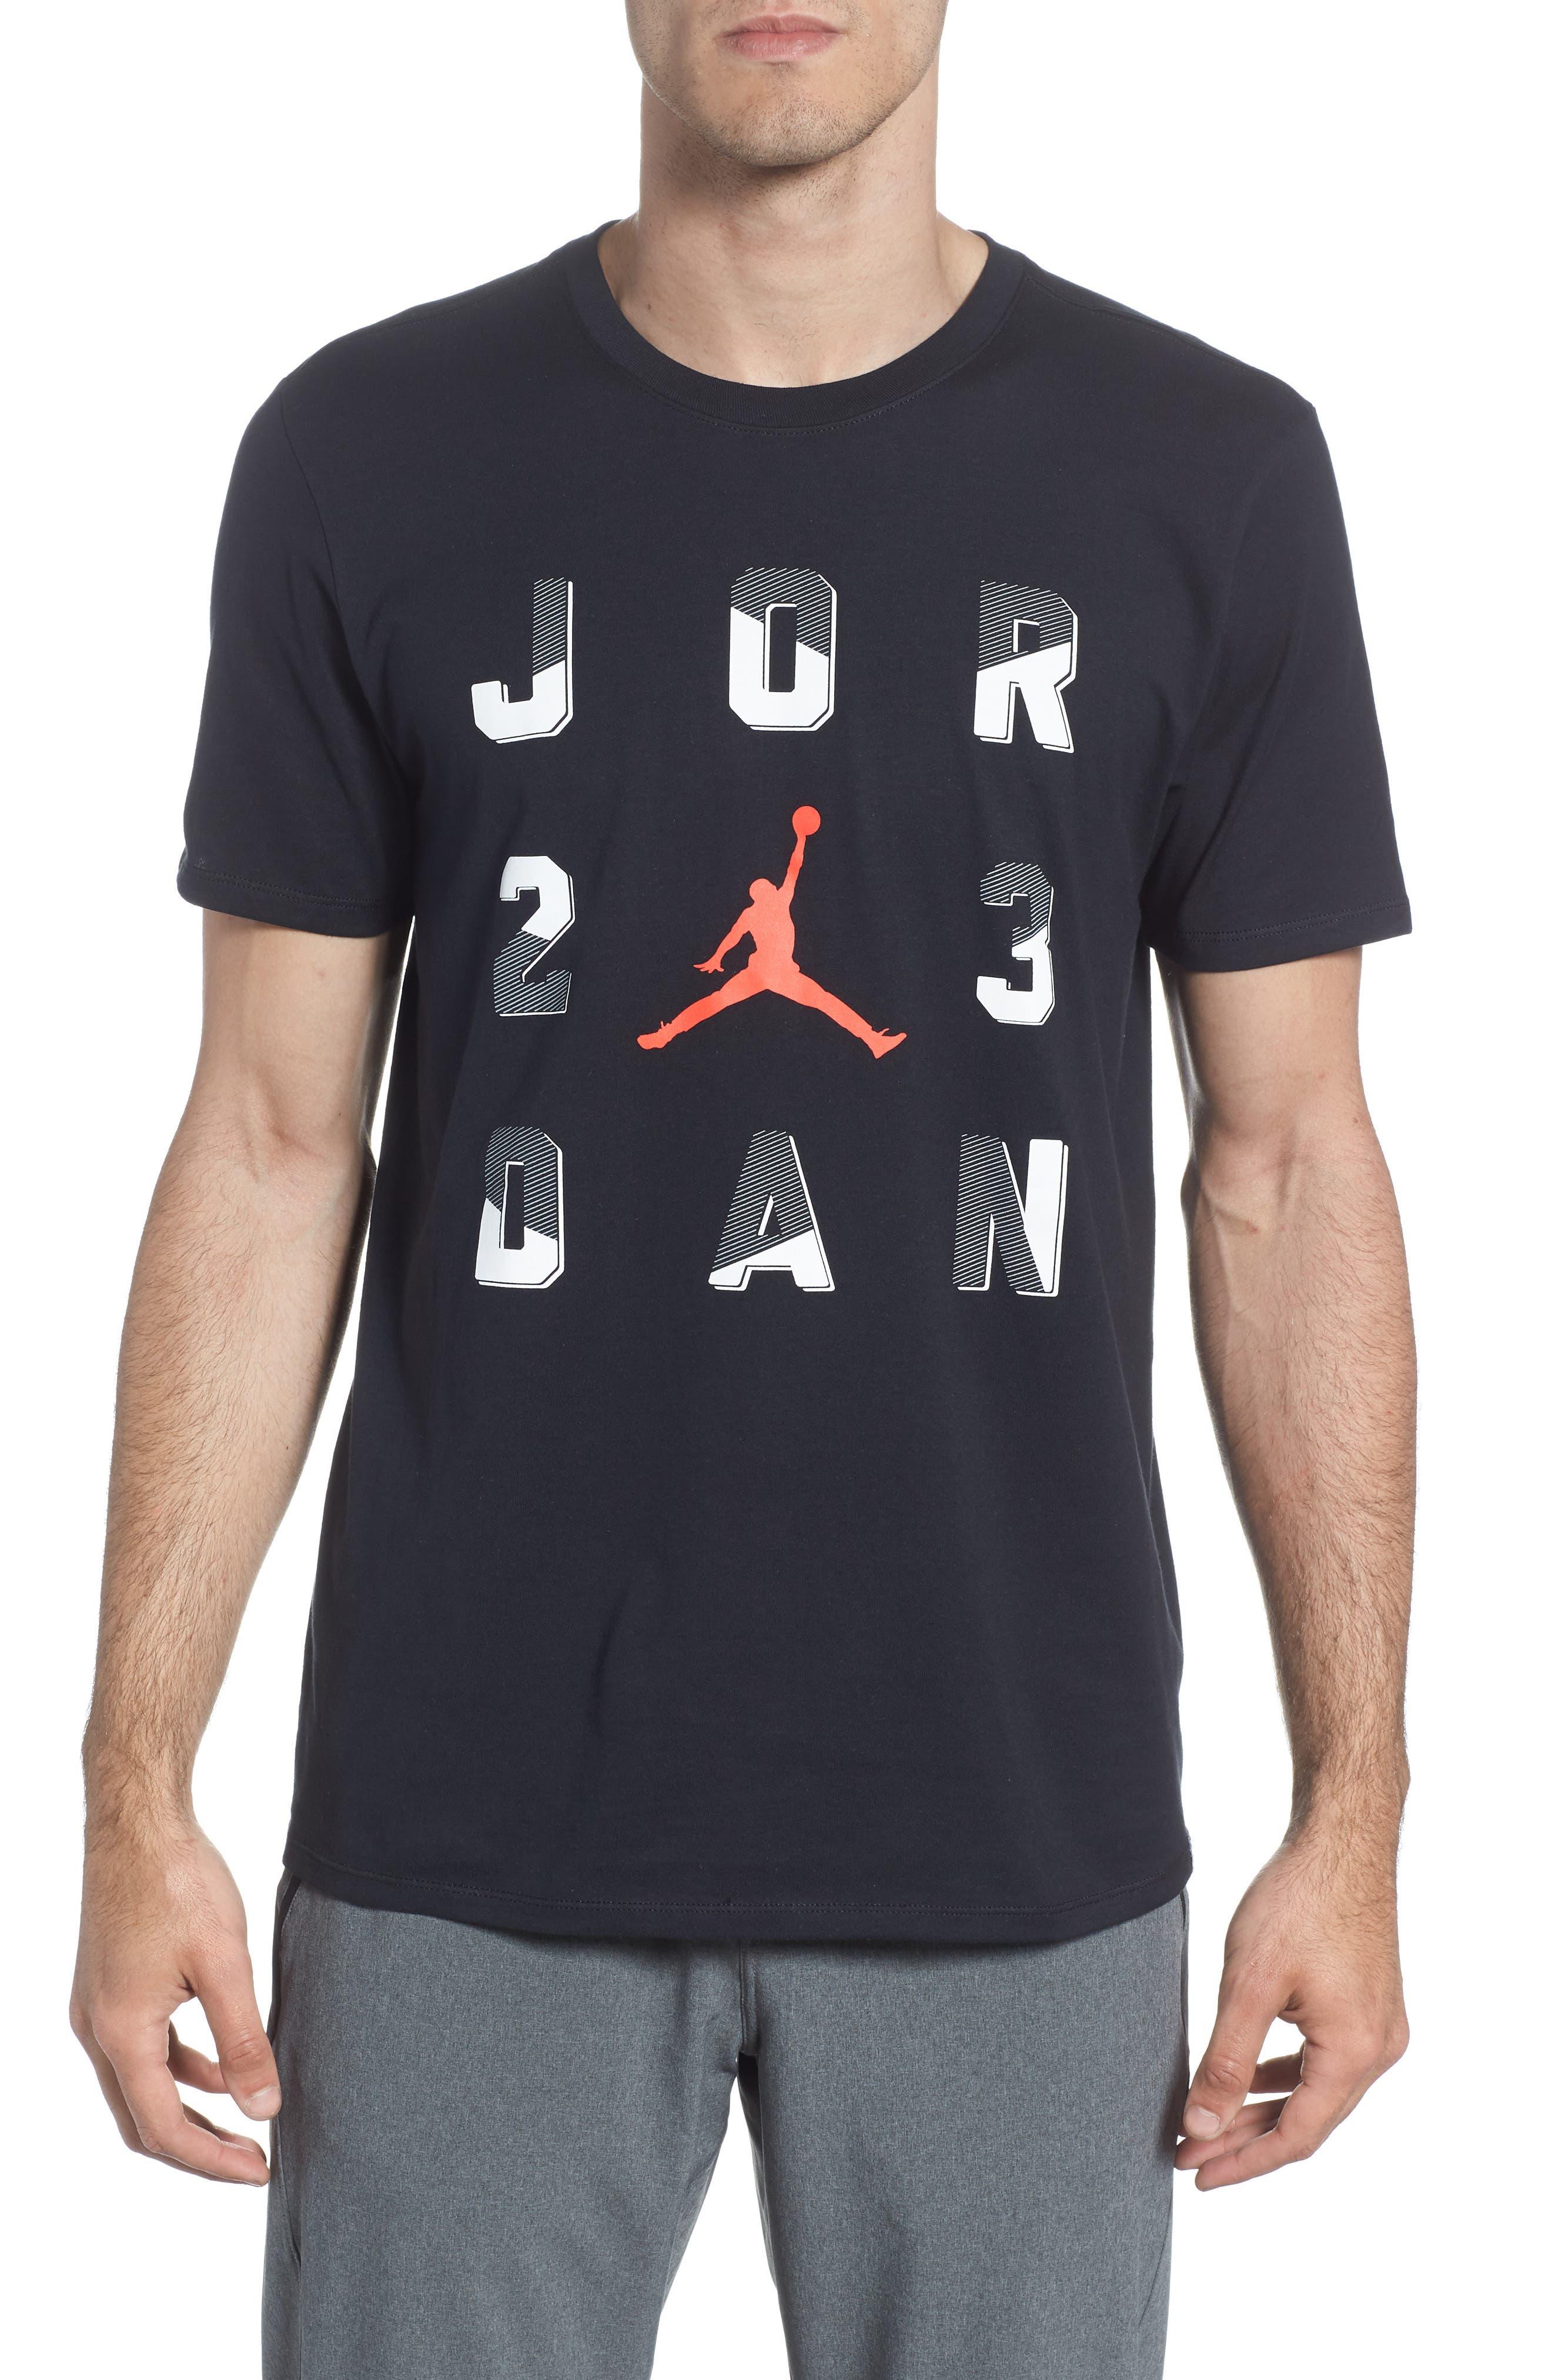 Sportswear 23 T-Shirt,                             Main thumbnail 1, color,                             BLACK/ INFRARED 23